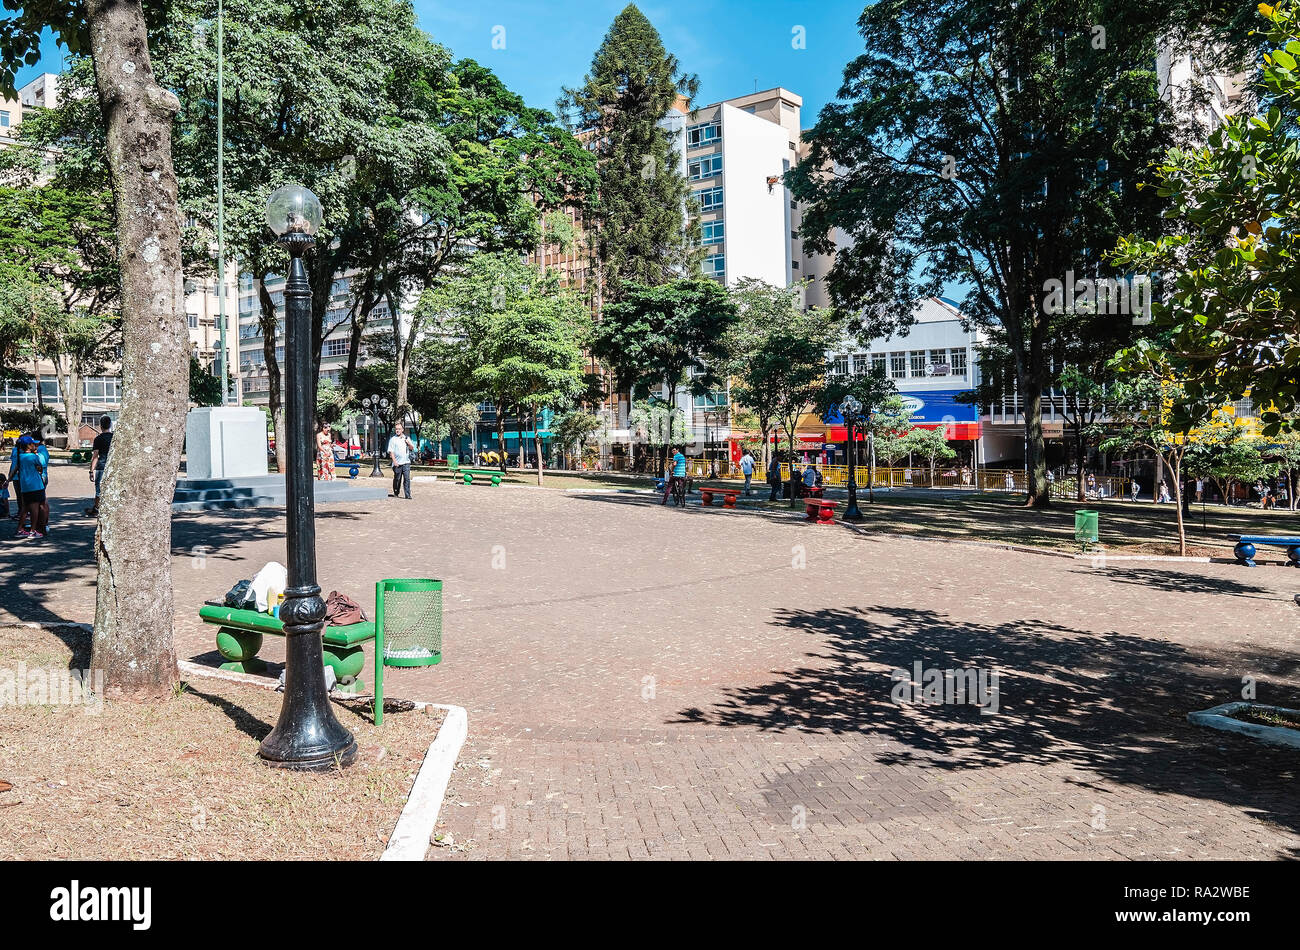 Londrina - PR, Brazil - December 12, 2018: Ordinary day at Marechal Floriano Peixoto square (Praça da Bandeira) in Londrina city. Square with people,  - Stock Image